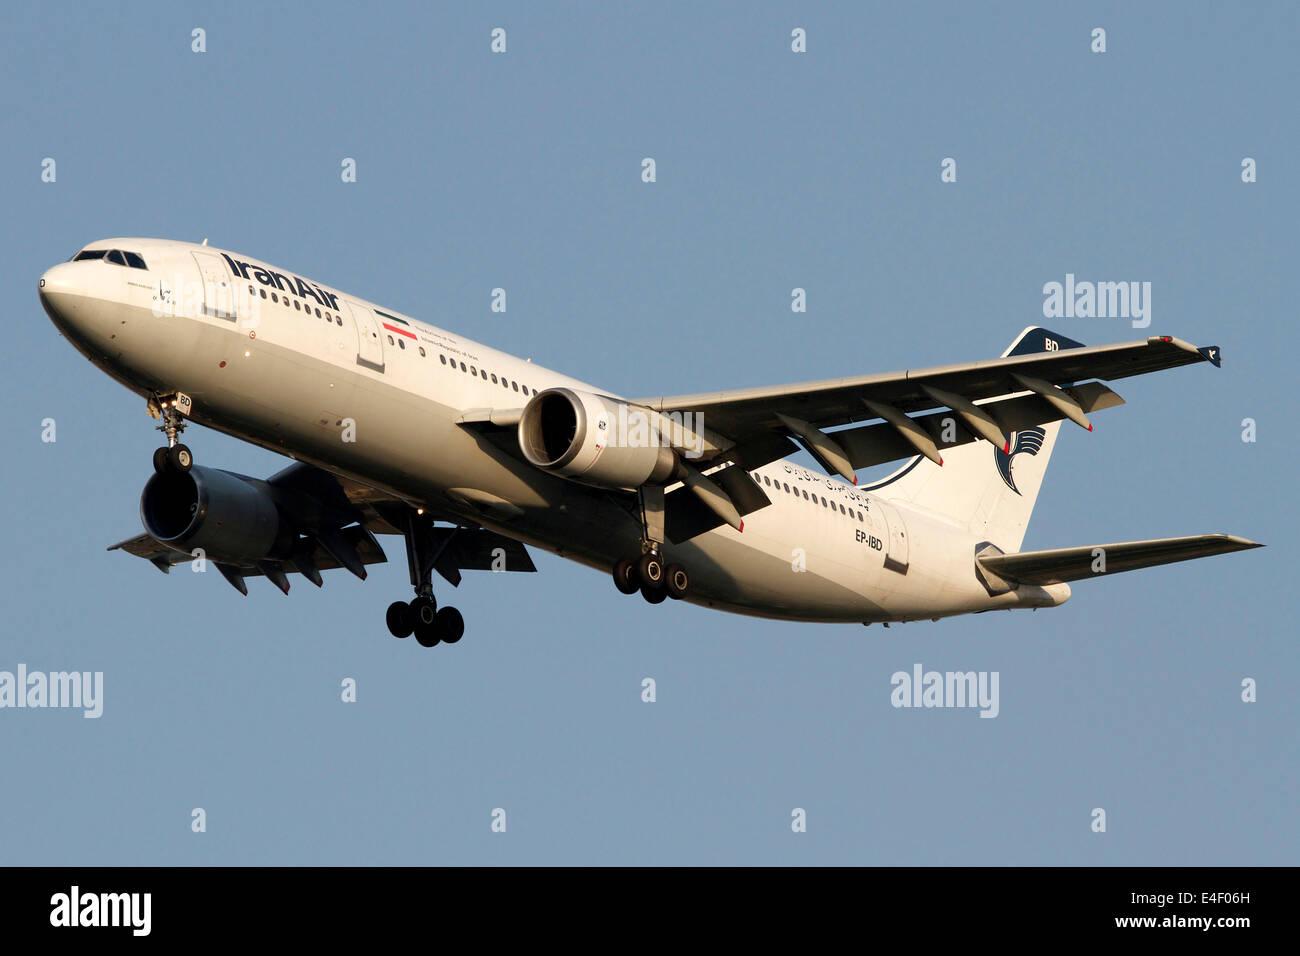 Airbus A310 of Iran Air. - Stock Image